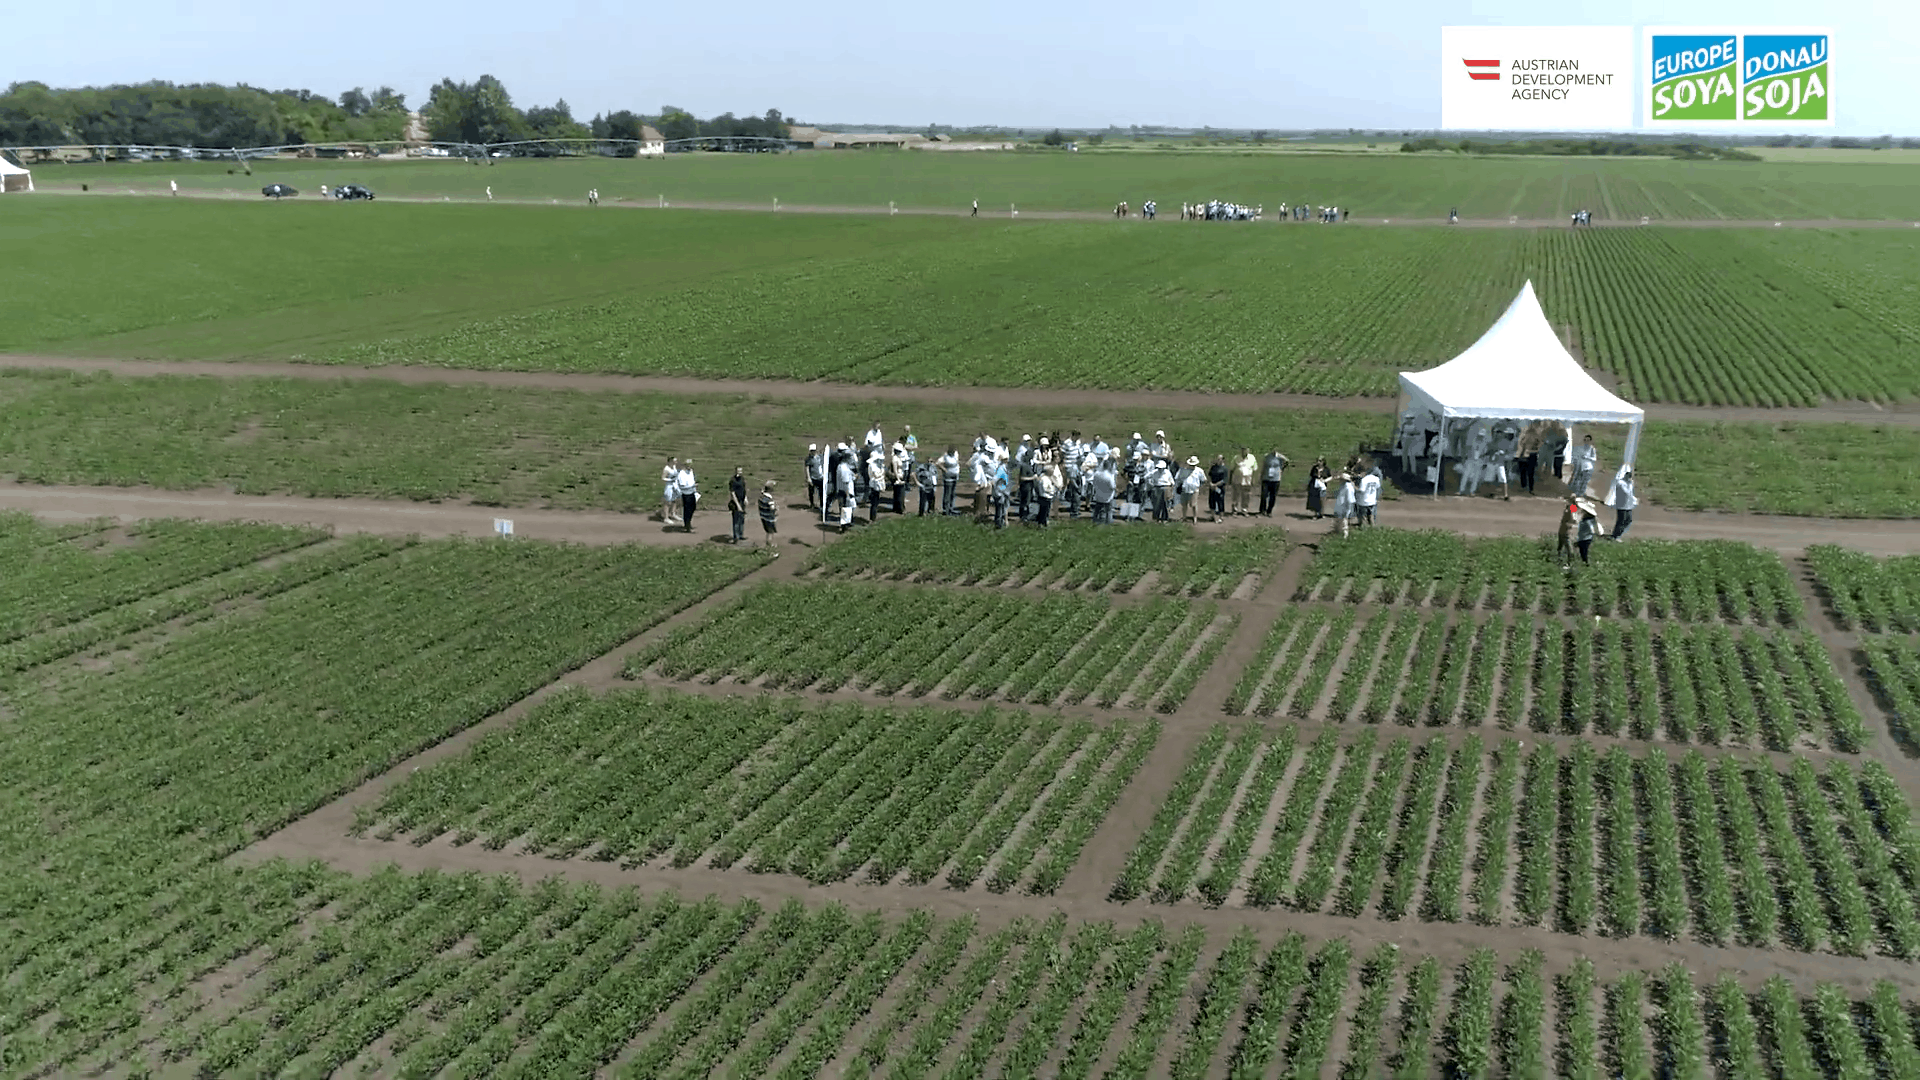 Dan polja Dunav Soja, Lugovo 2019